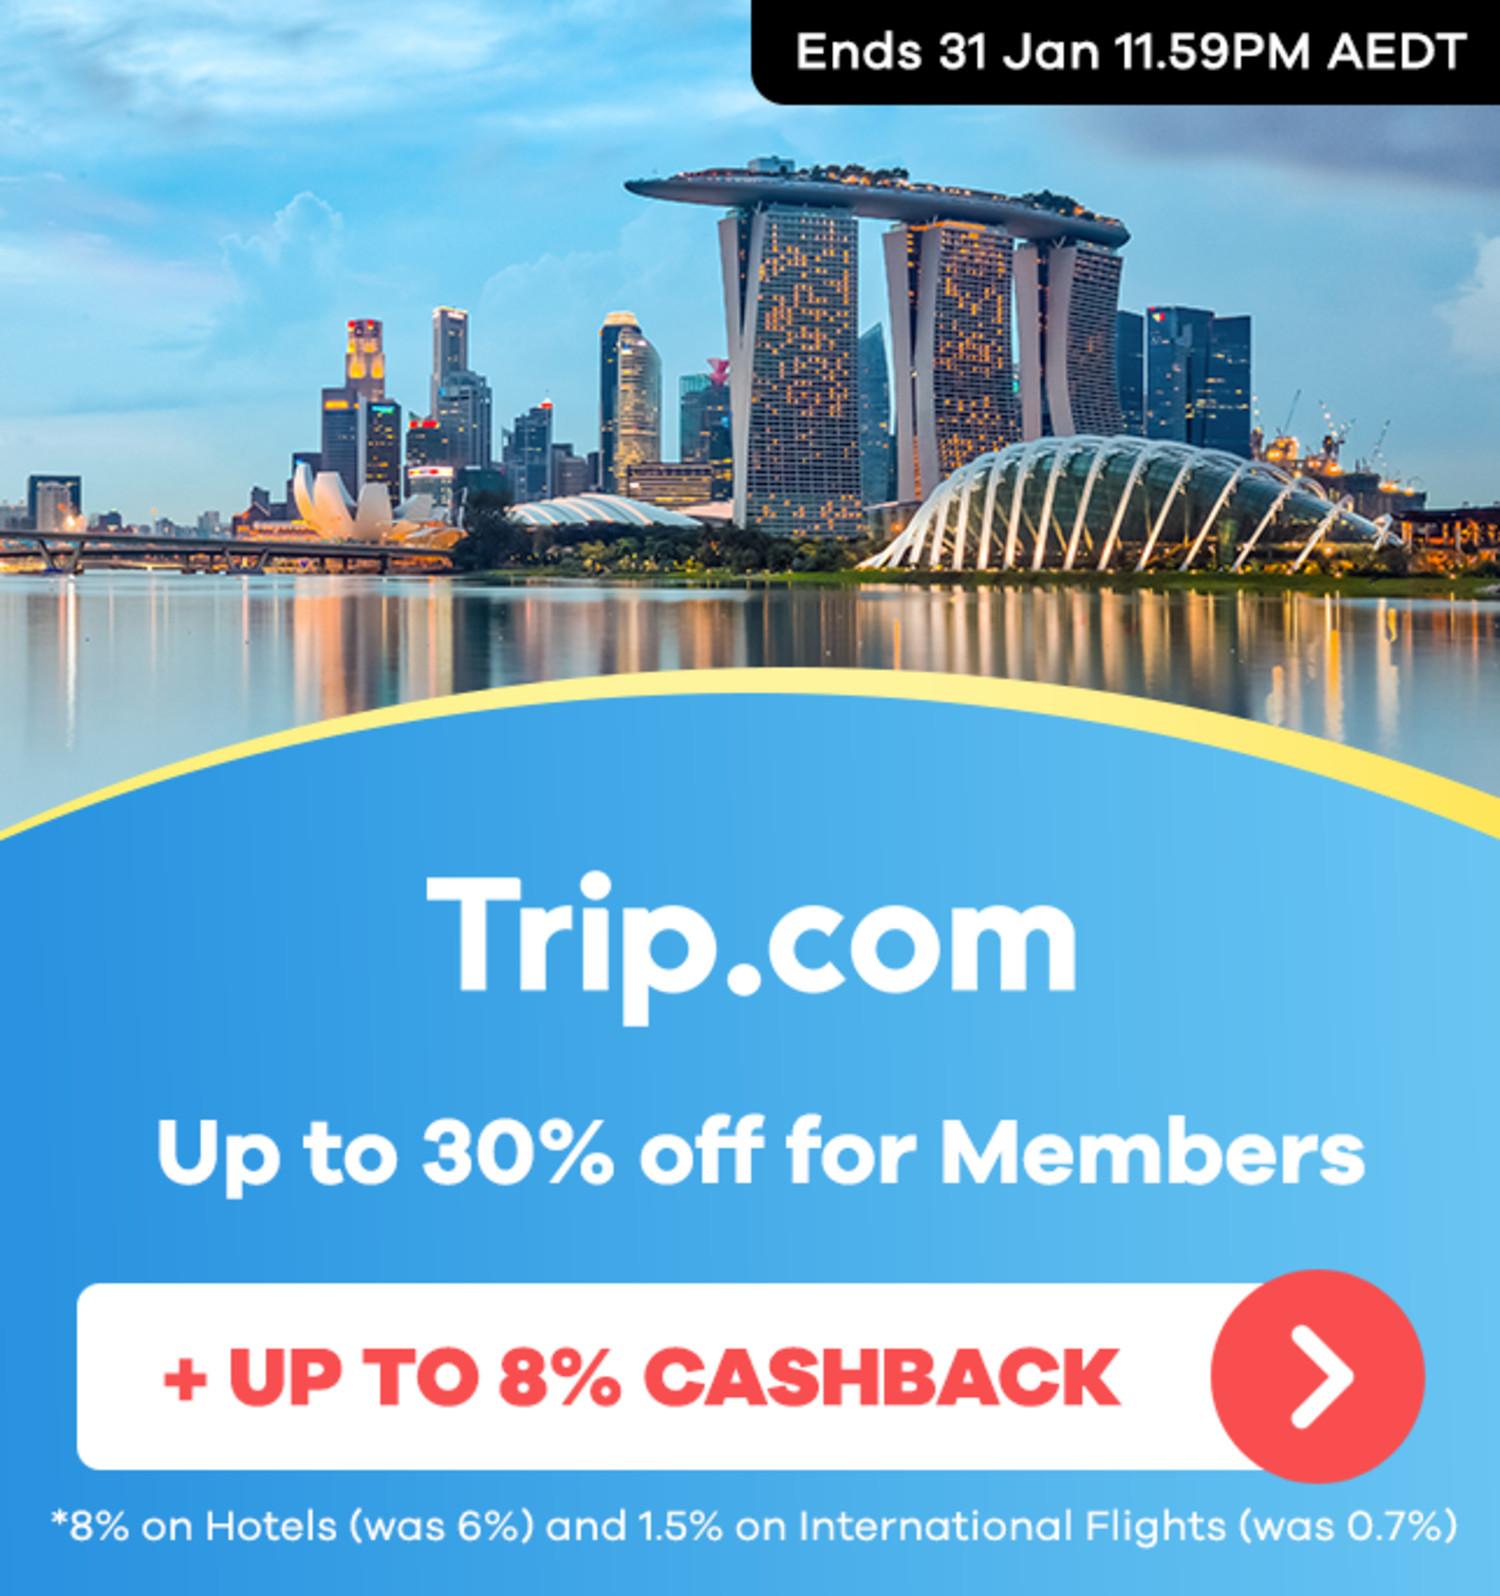 Trip.com - Up to 8% Upsized Cashback